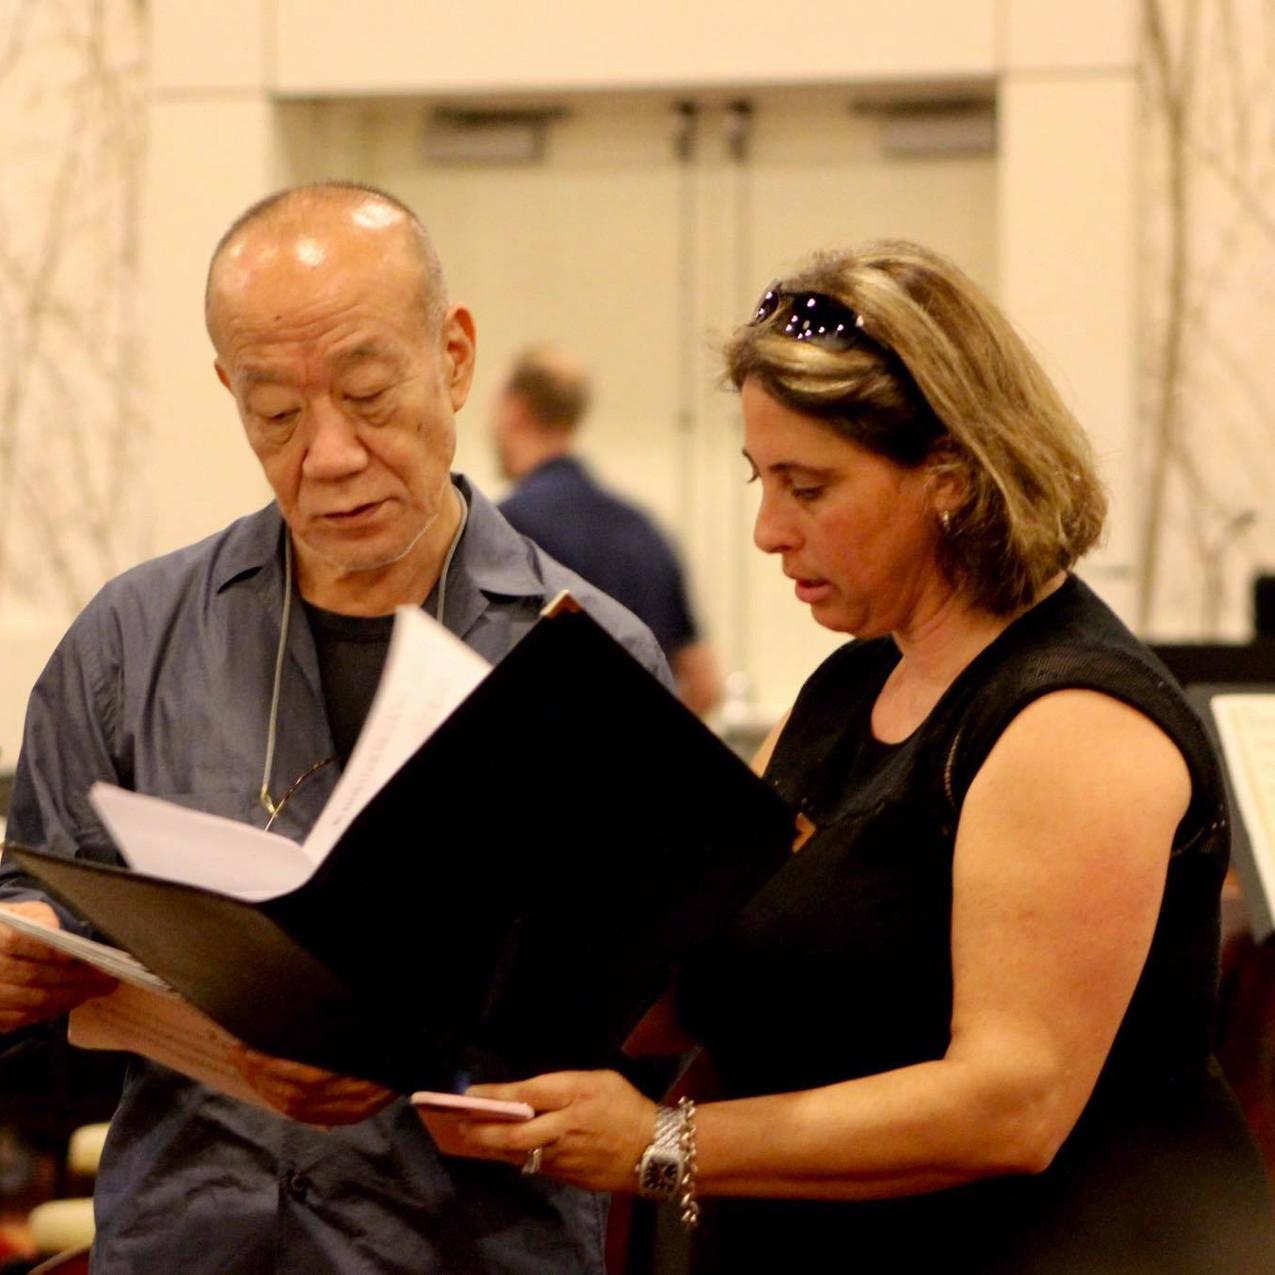 Anna Krendel and Joe Hisaishi